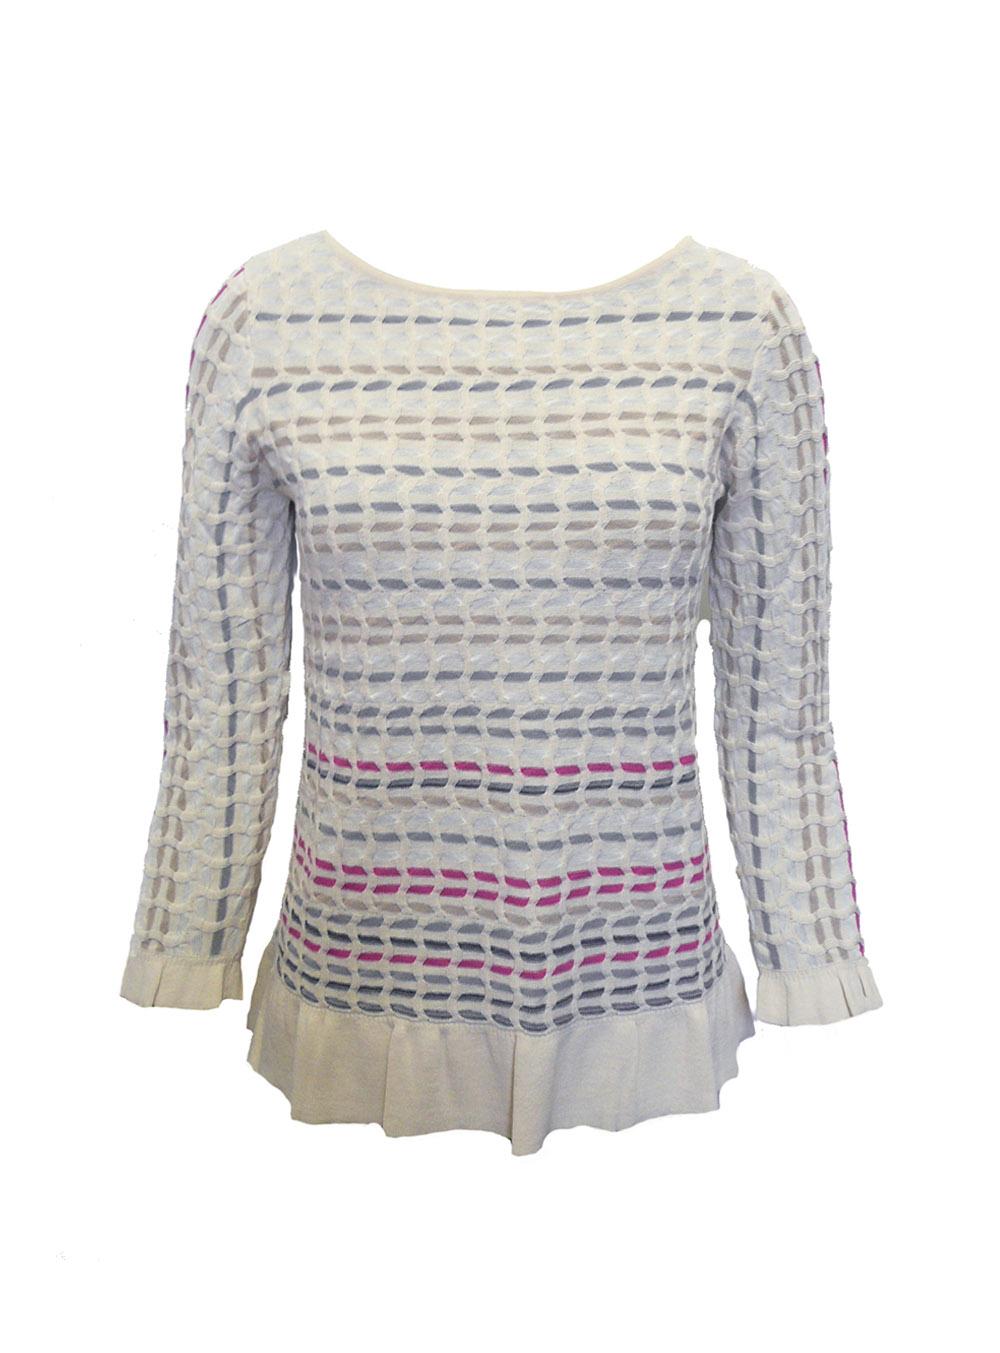 knt texture pattern sweater.jpg